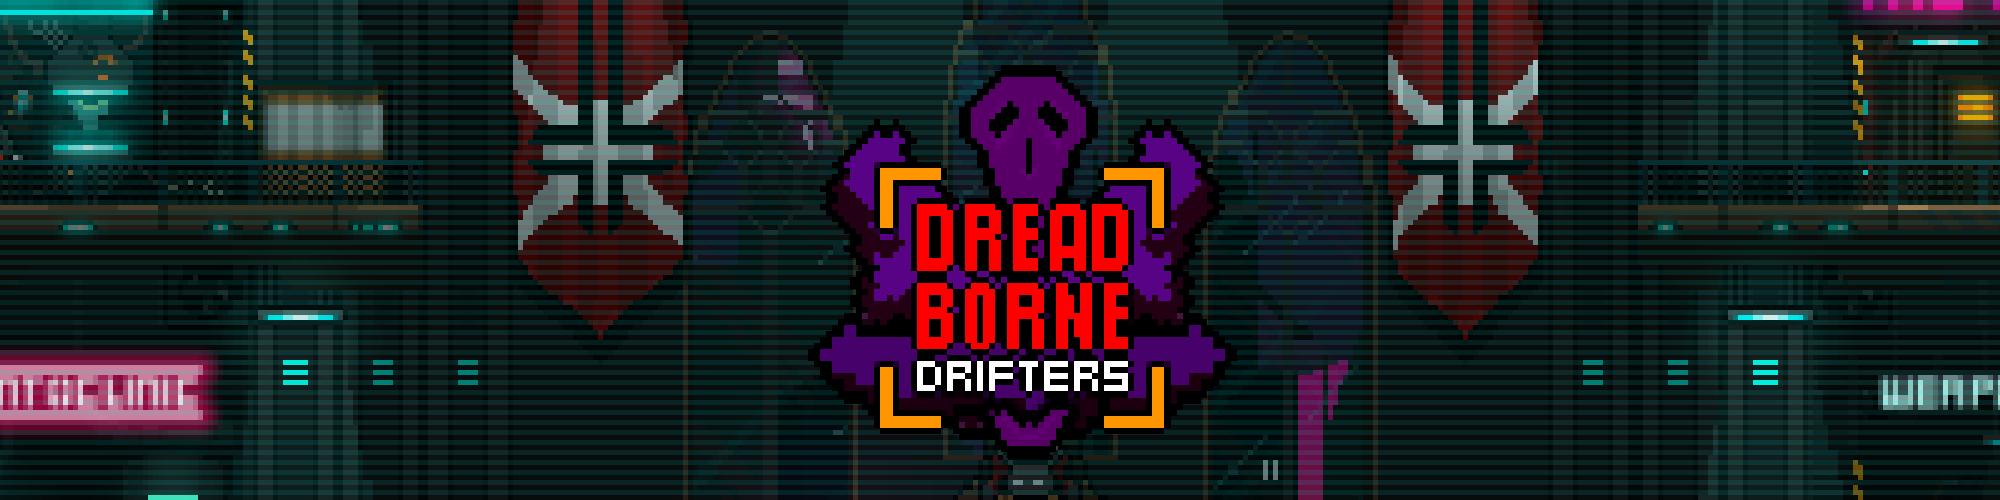 Dreadborne Drifters